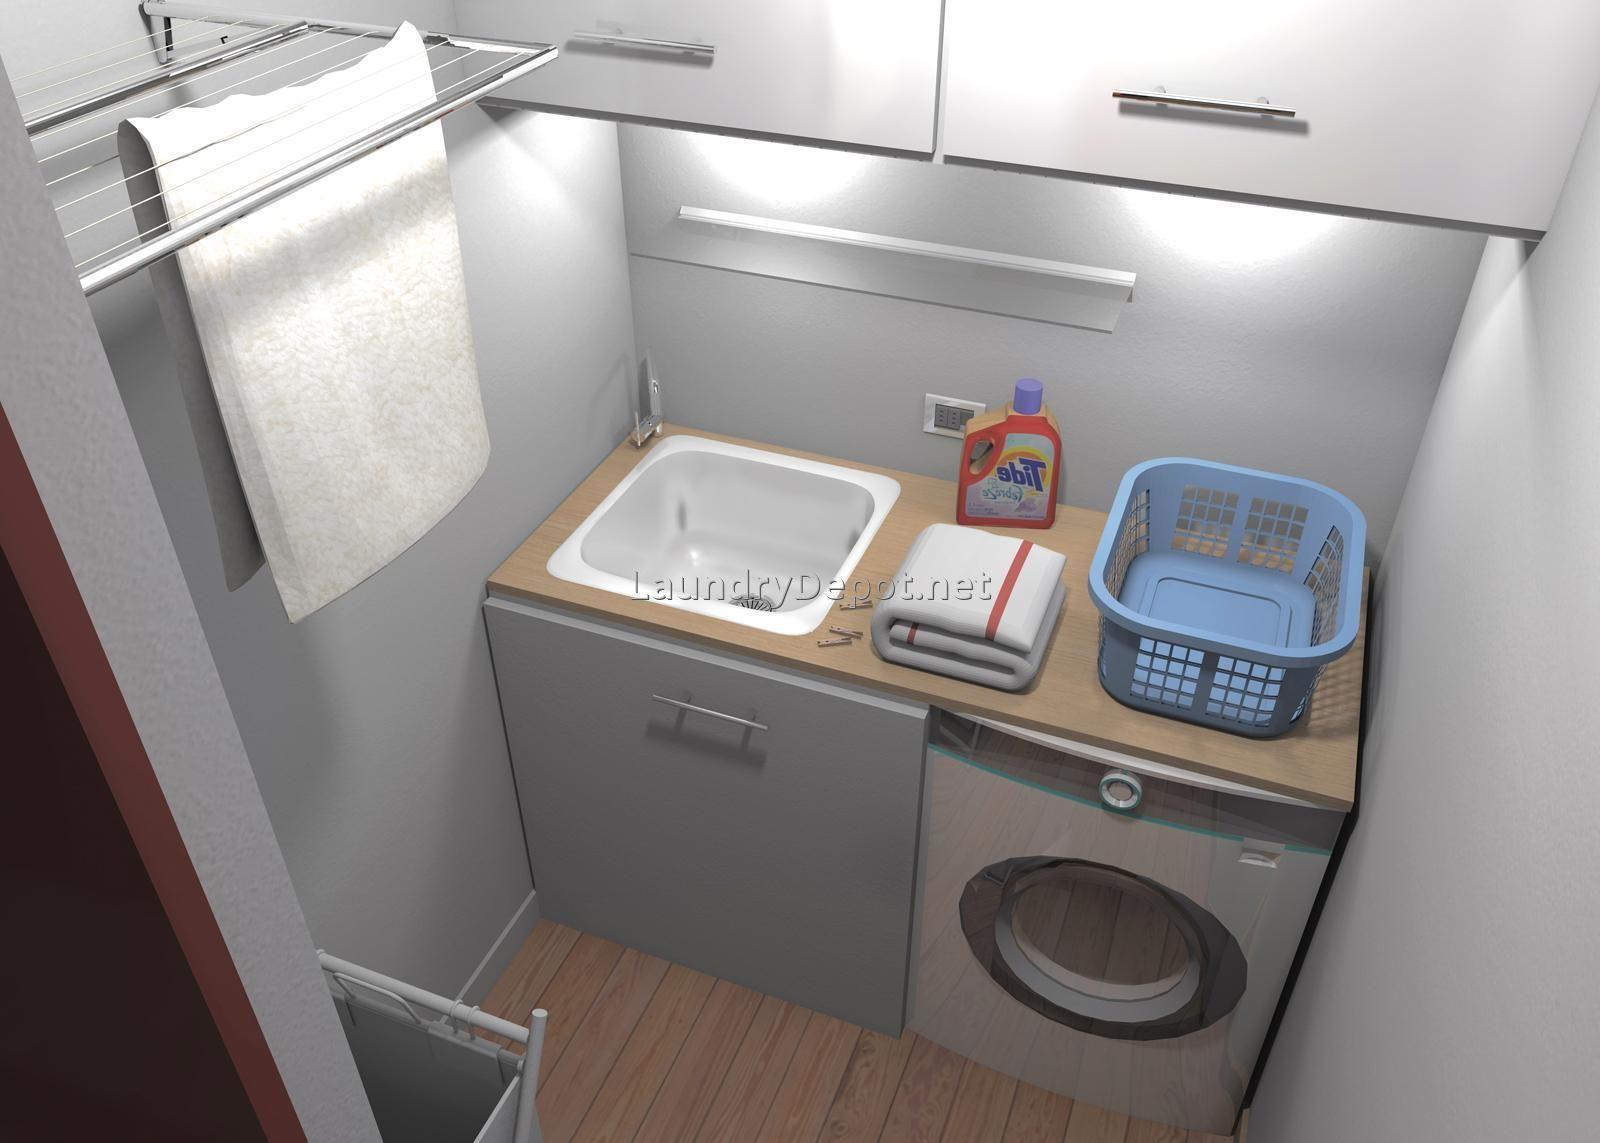 small-laundry-room-sinks-11.jpg (1600×1143) | Wet room ideas ...